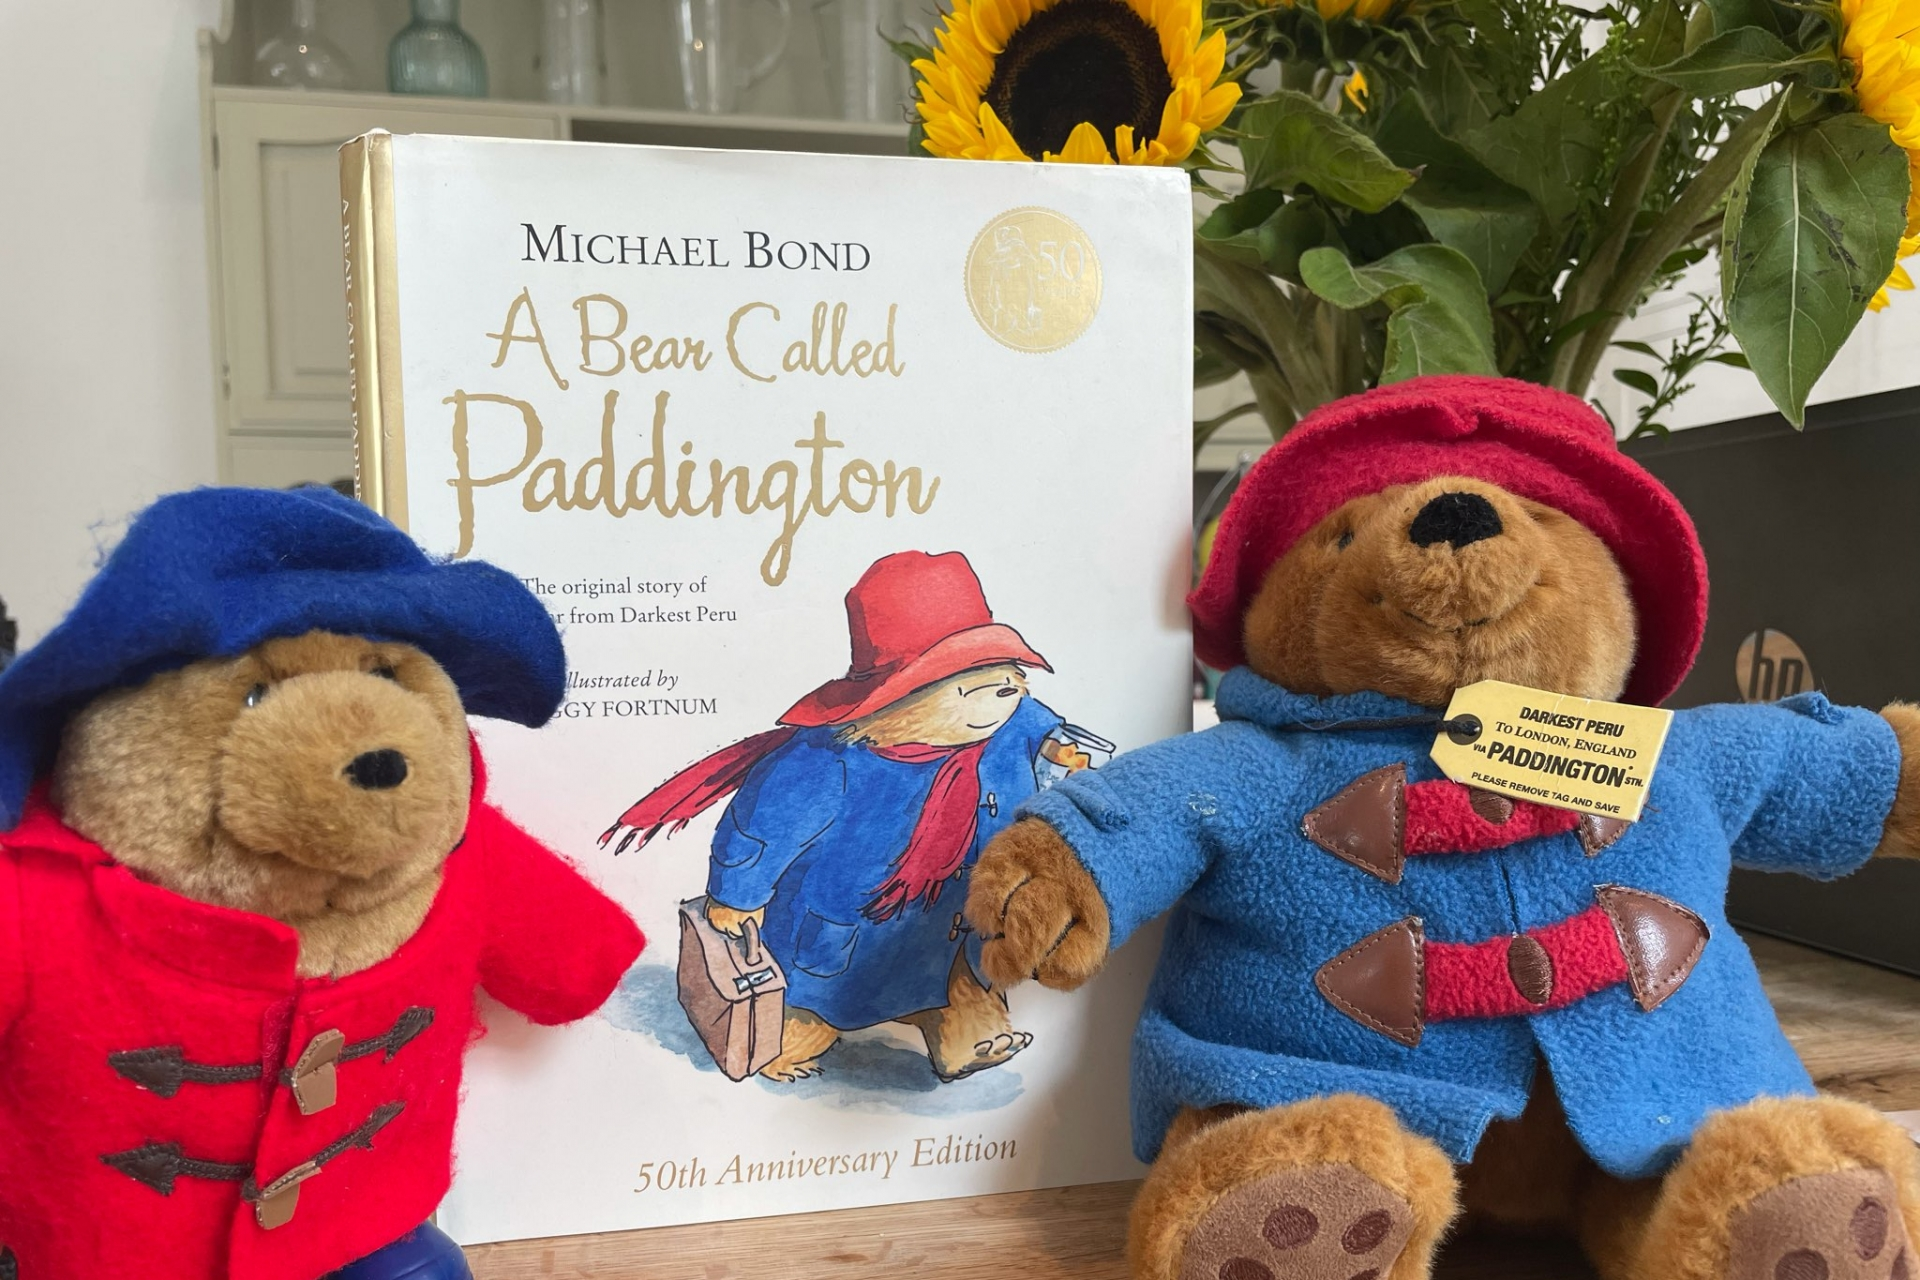 Paddington: The Story of a Bear Exhibition